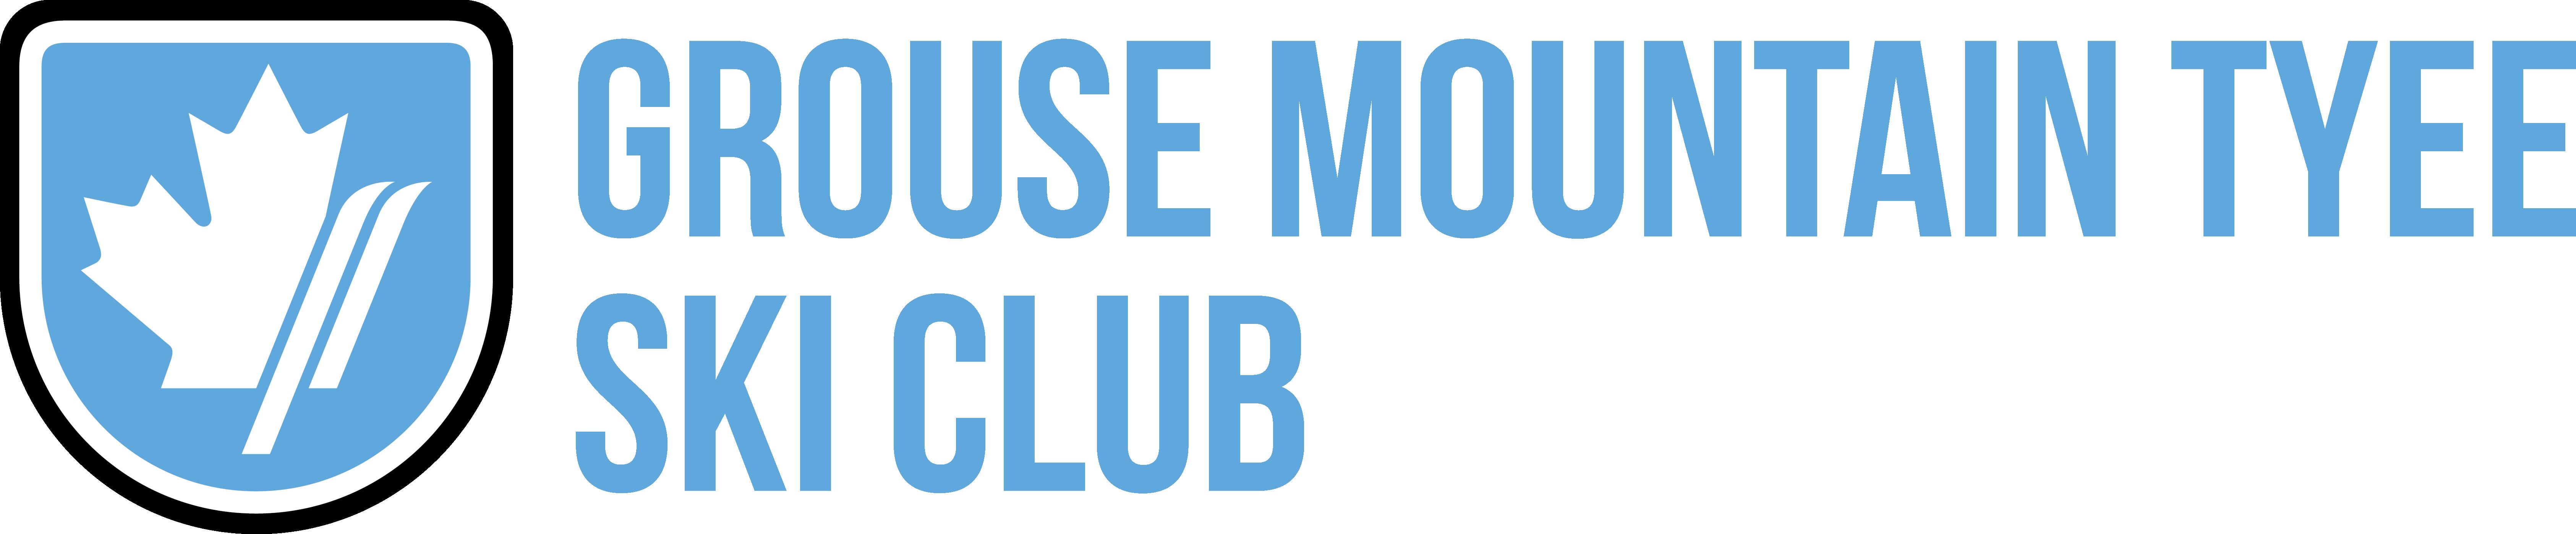 Grouse Mountain Tyee Ski Club